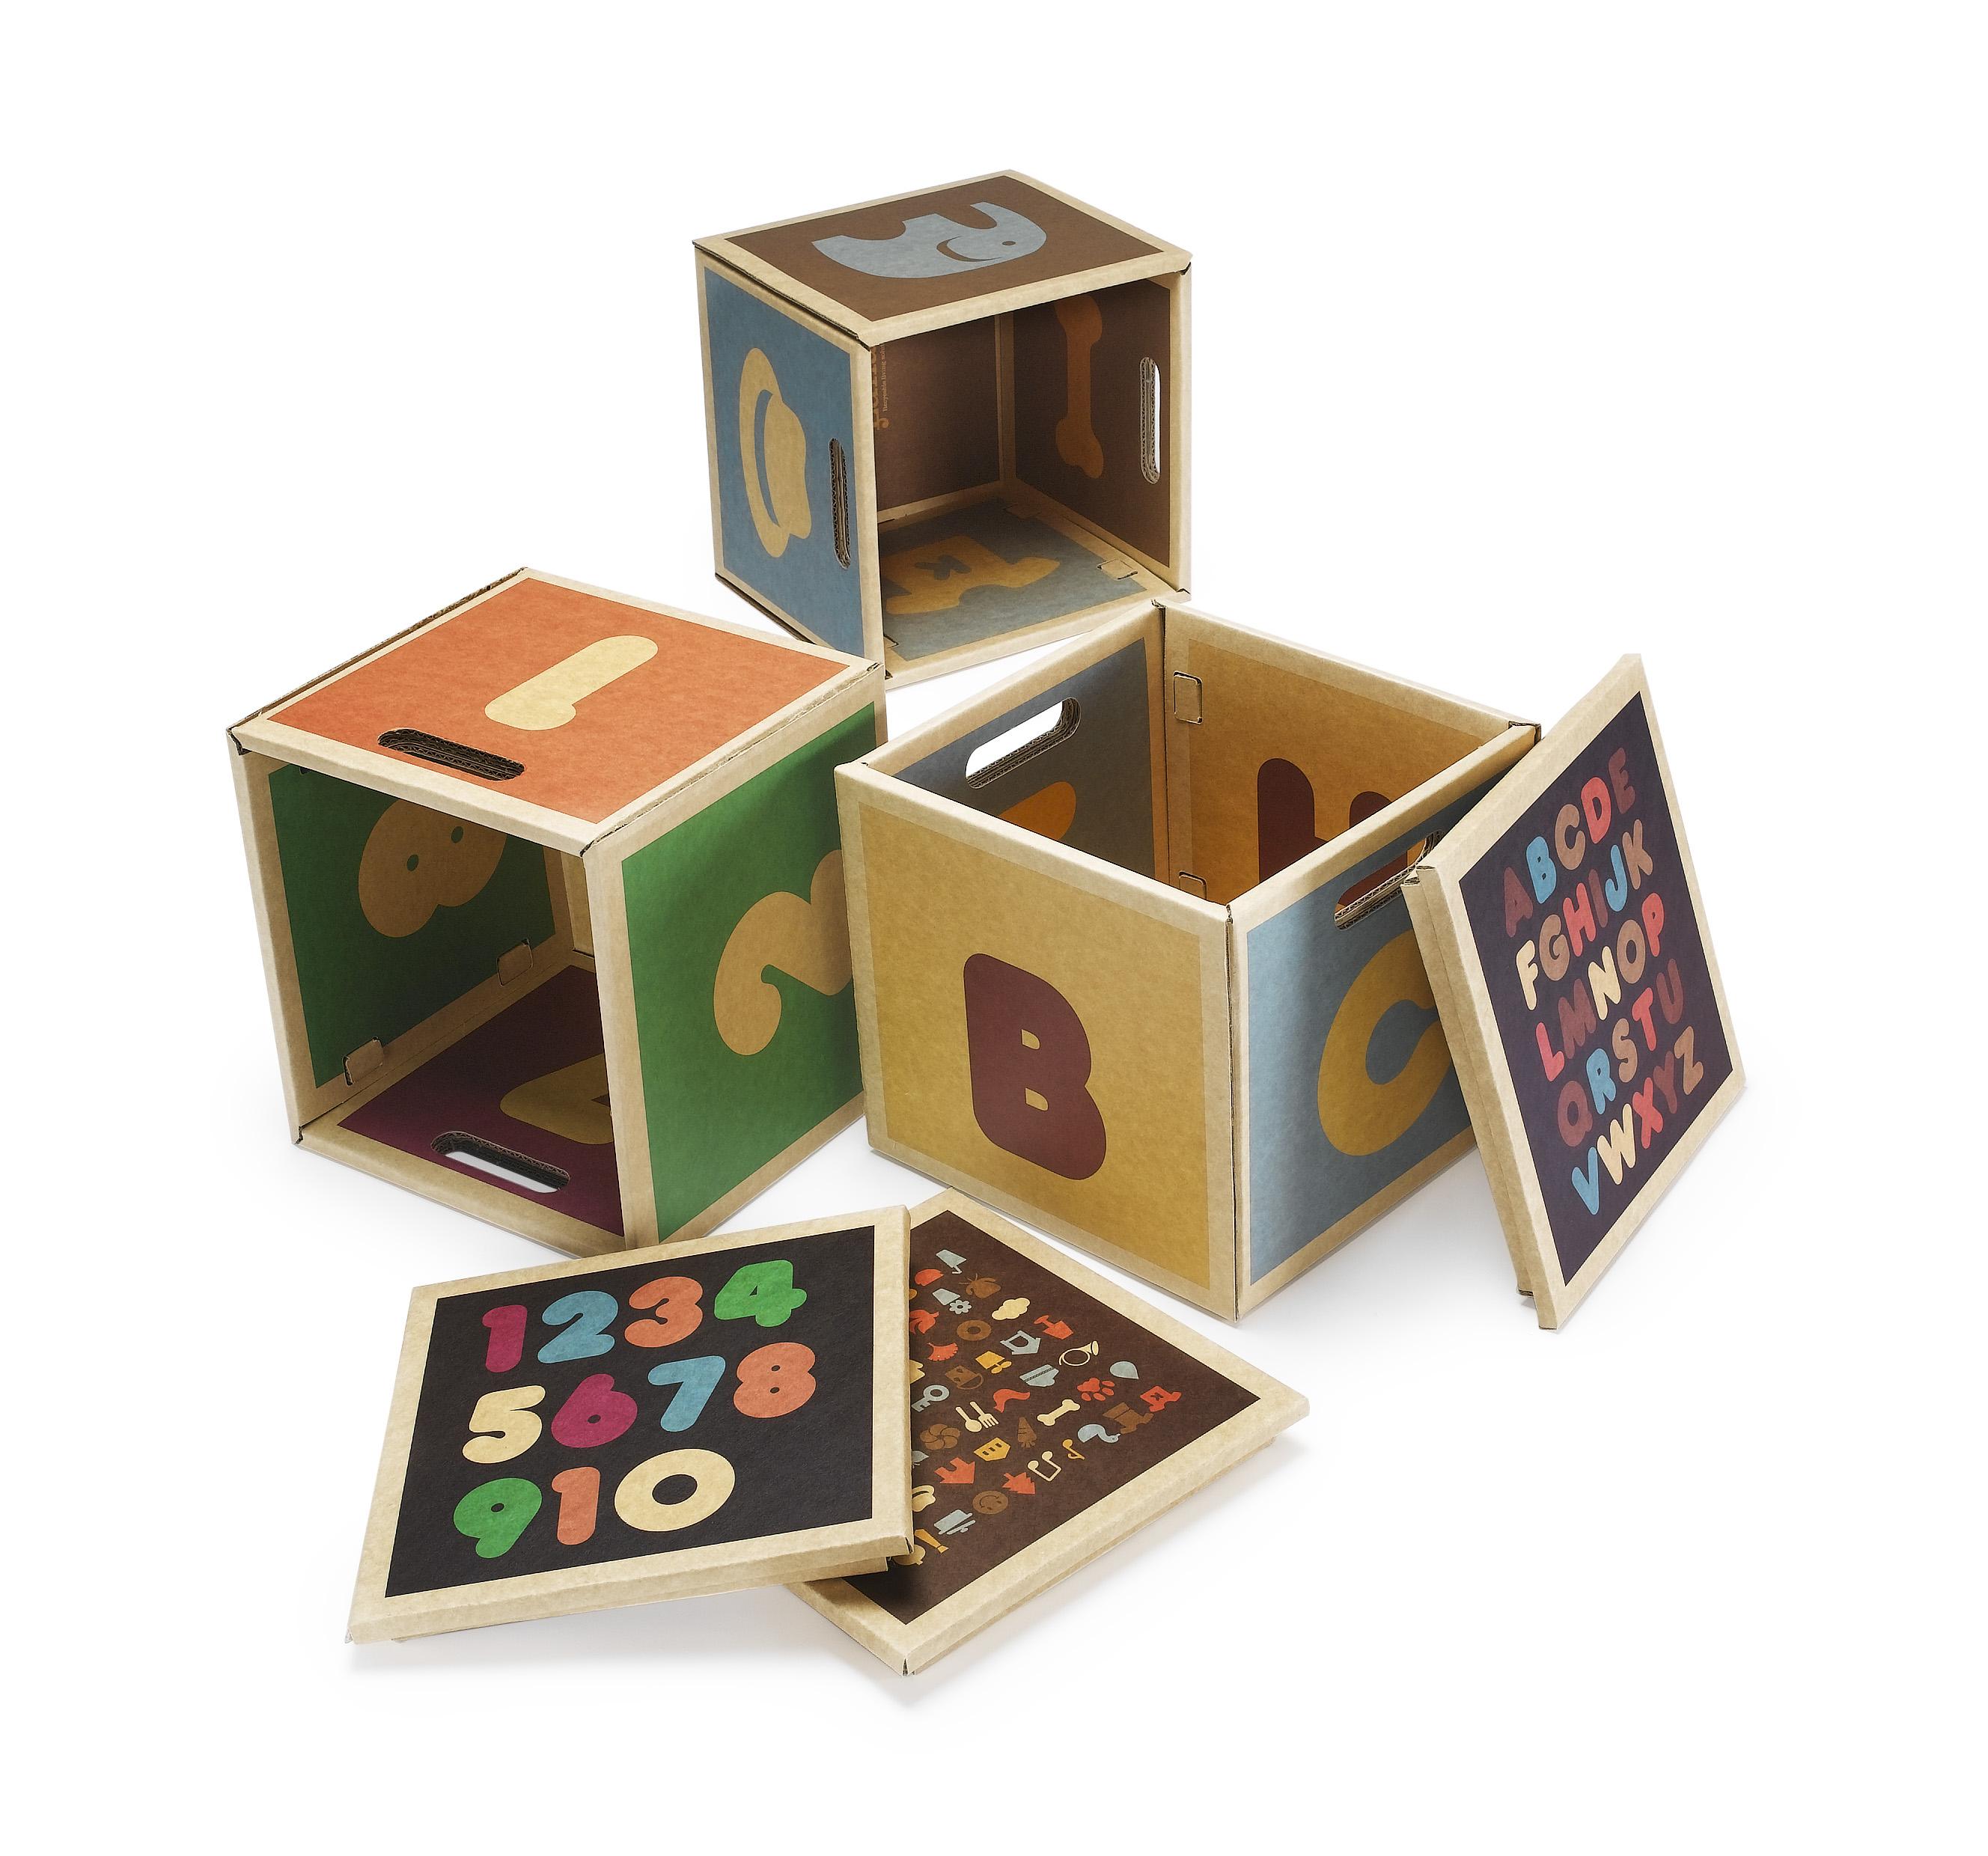 storage boxen von green lullaby mother 39 s finest. Black Bedroom Furniture Sets. Home Design Ideas